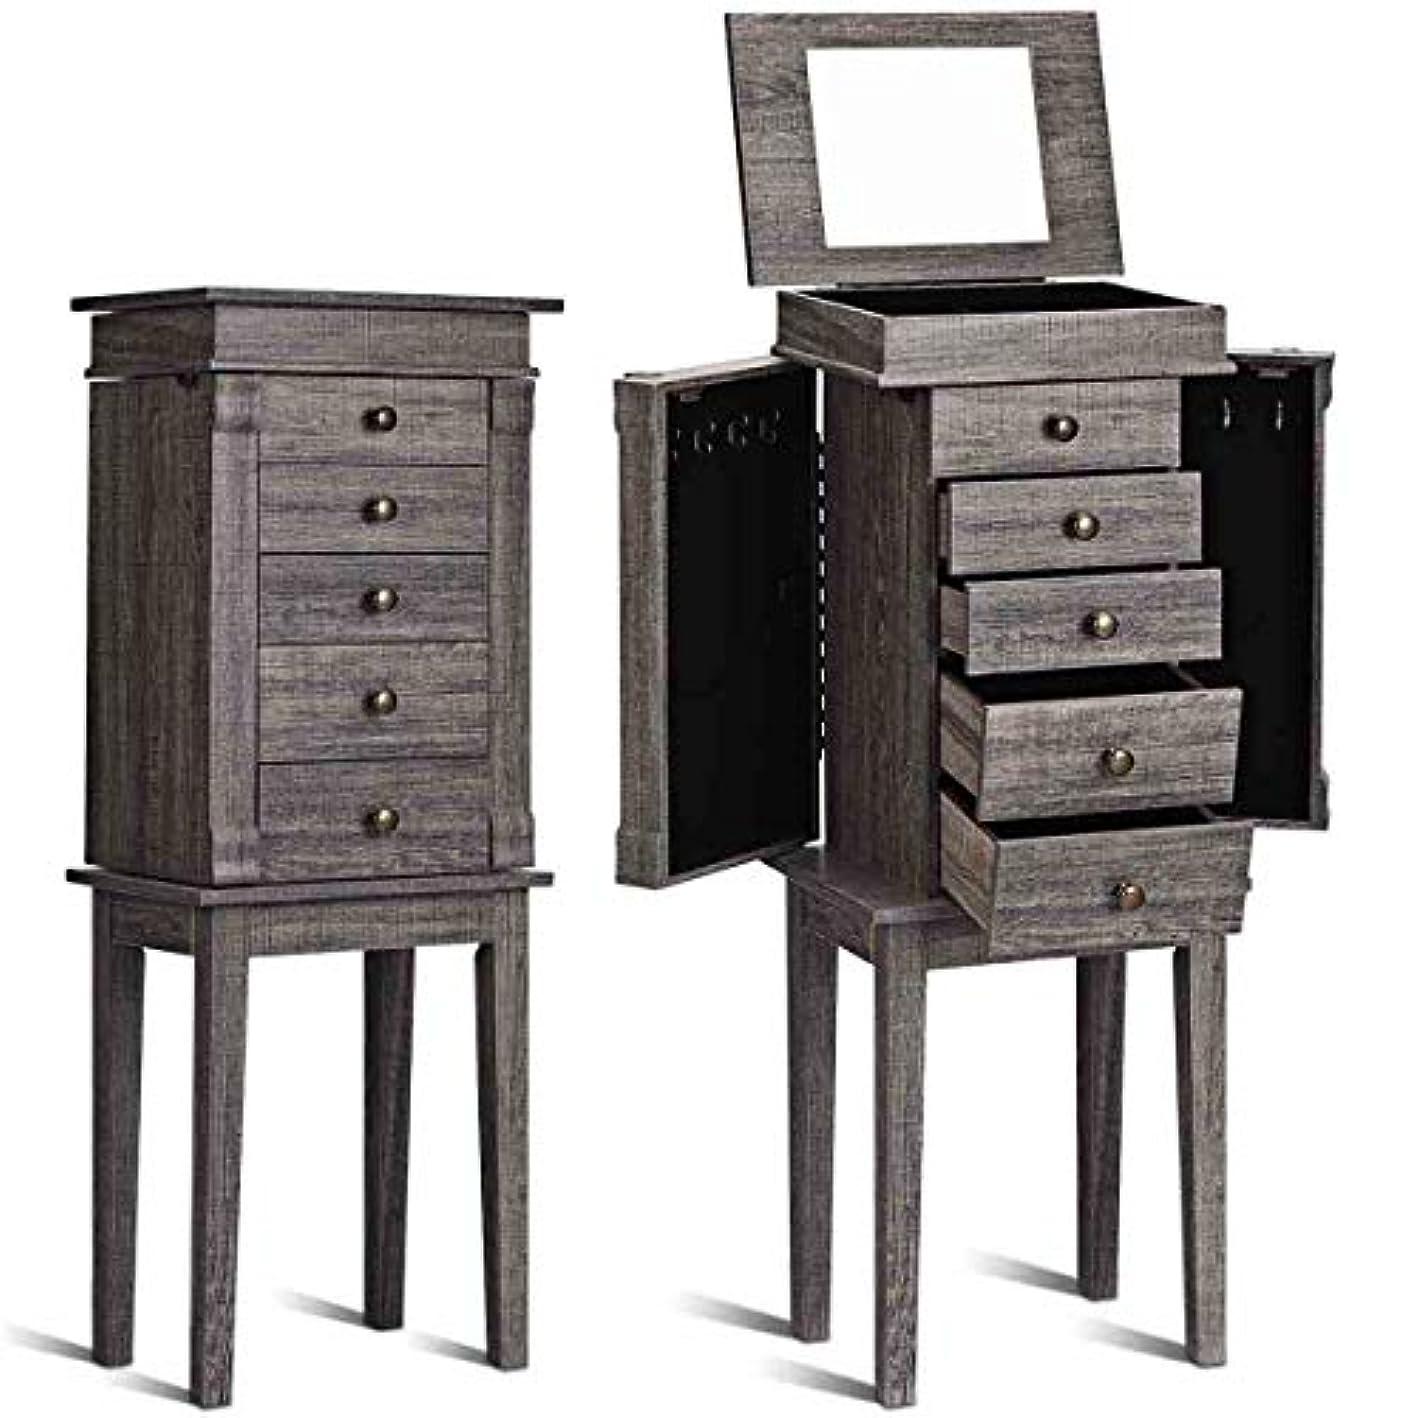 WATERJOY Jewelry Armoire Mirrored Jewelry Cabinet Free Standing Jewelry Organizer with Wooden Legs